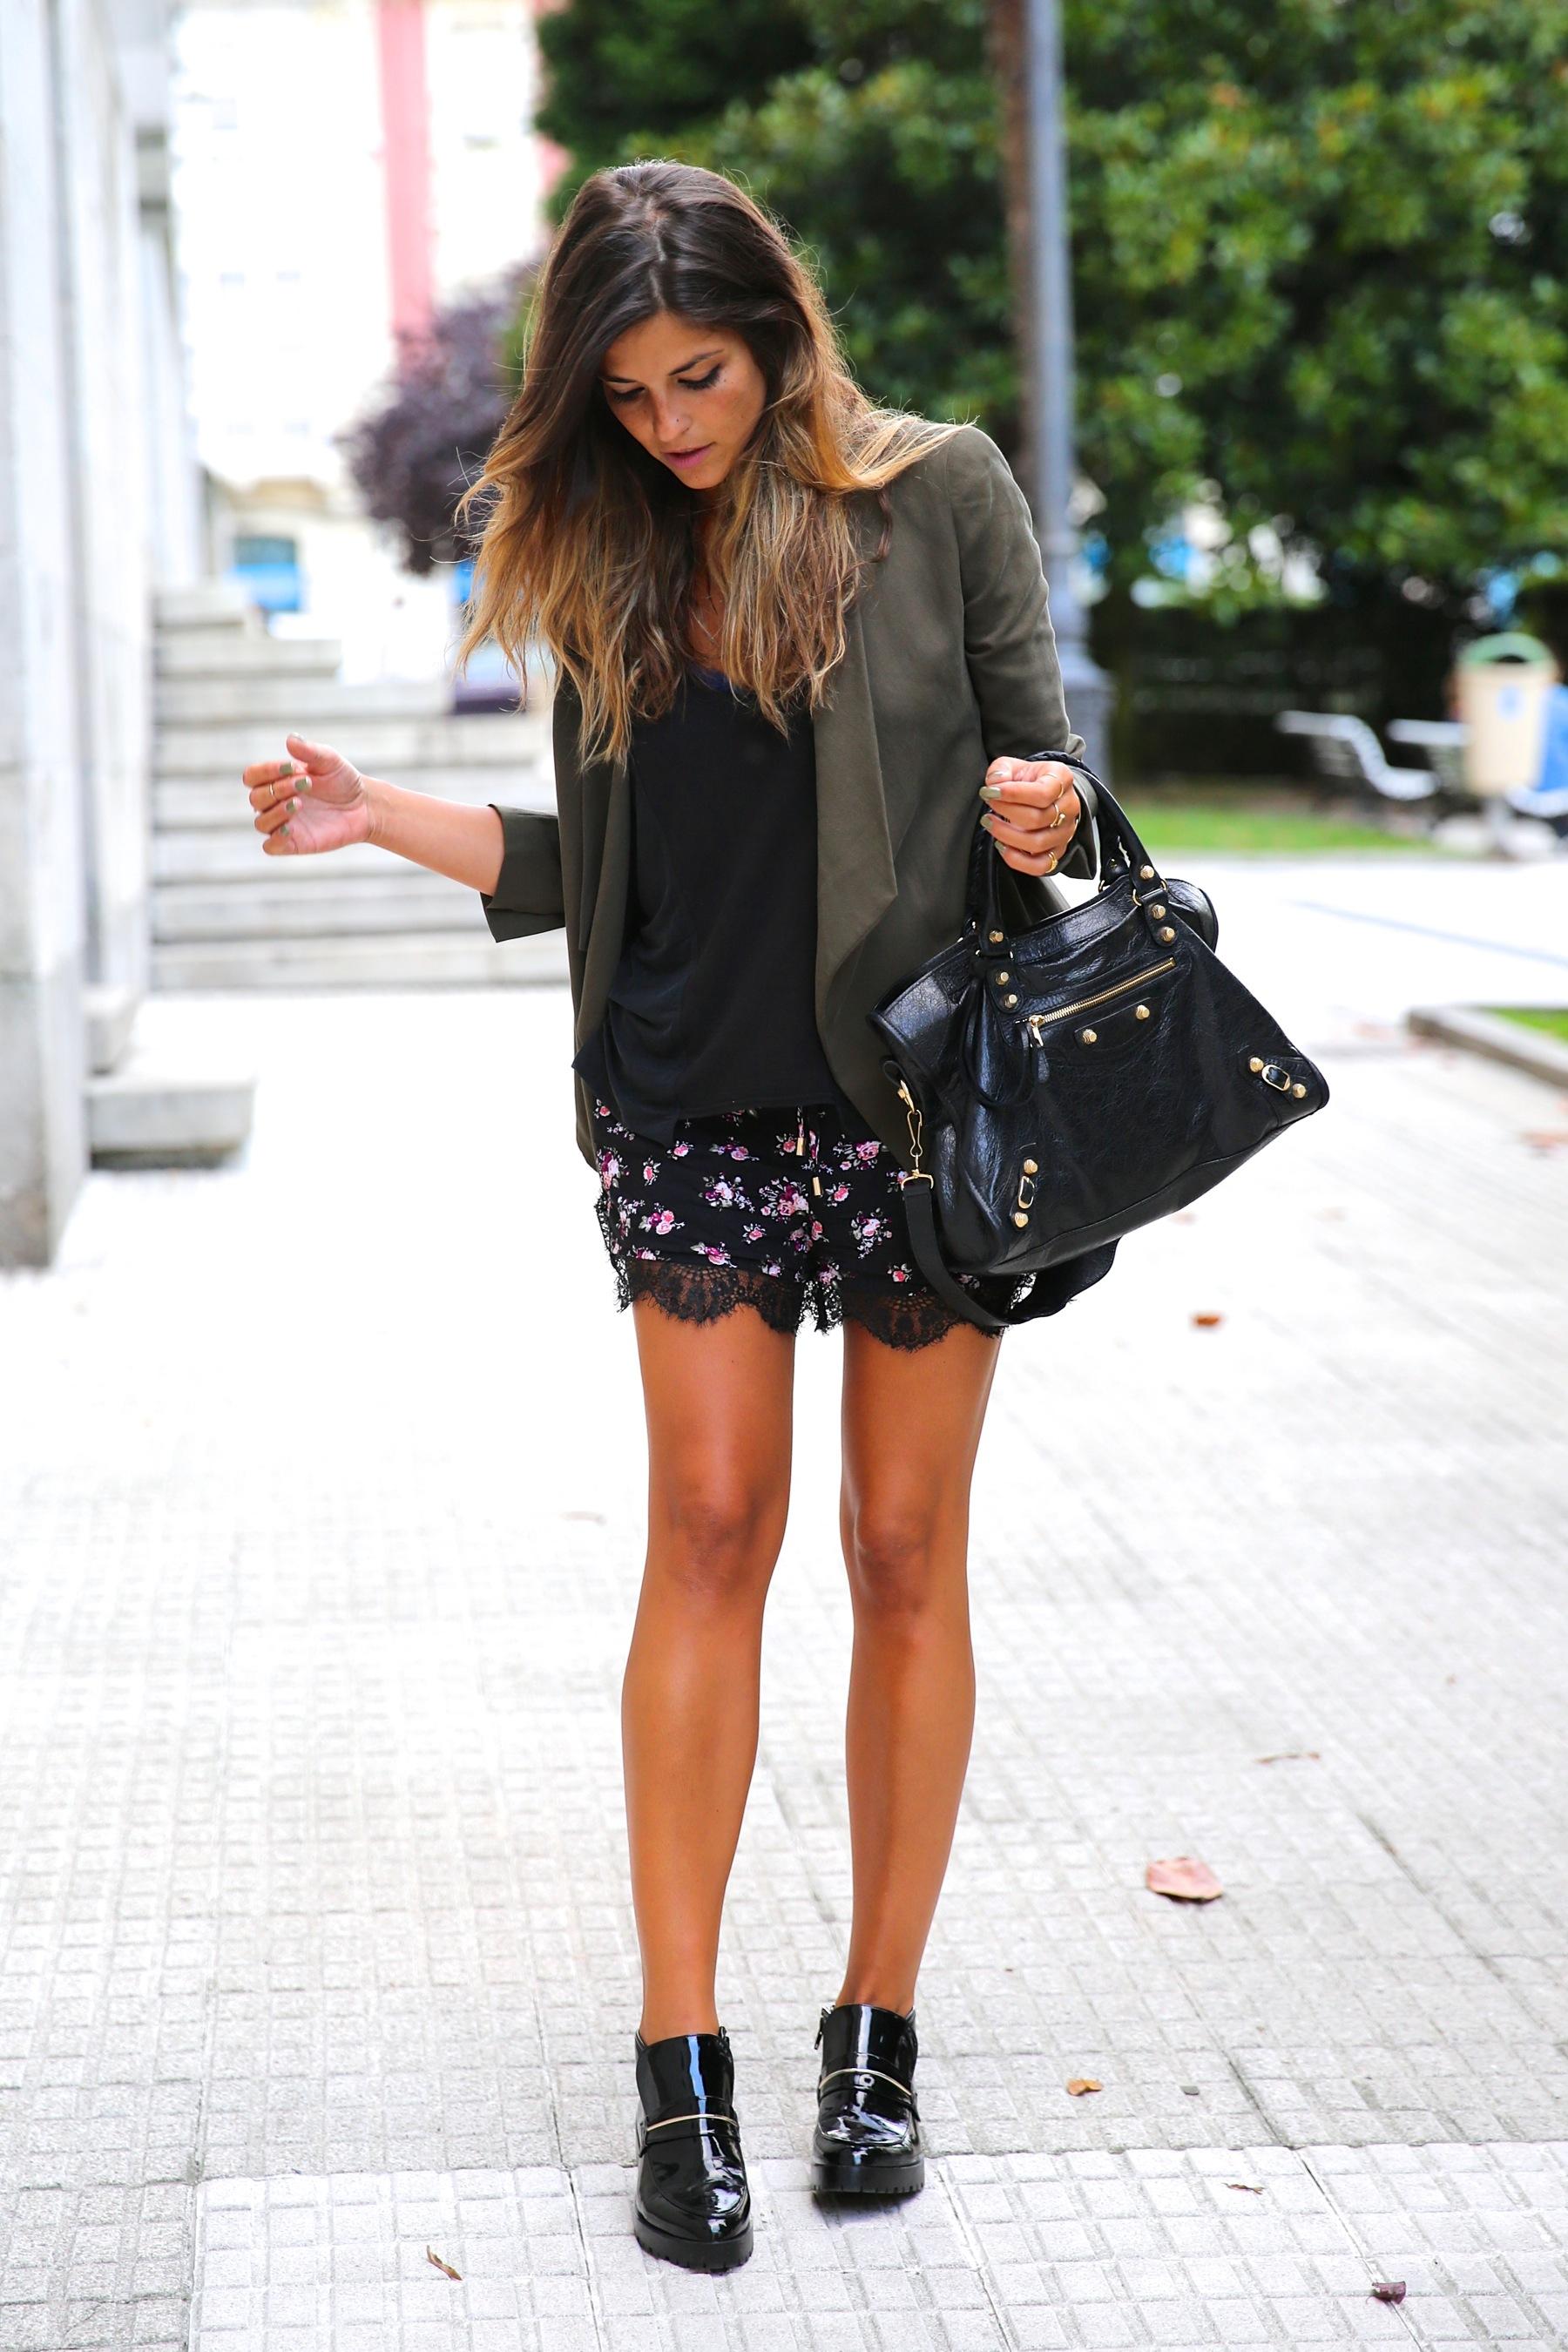 trendy_taste-look-outfit-street_style-ootd-blog-blogger-fashion_spain-moda_españa-khaki_blazer-blazer_caqui-flower_print-estampado_flores-shorts-botines_charol-11